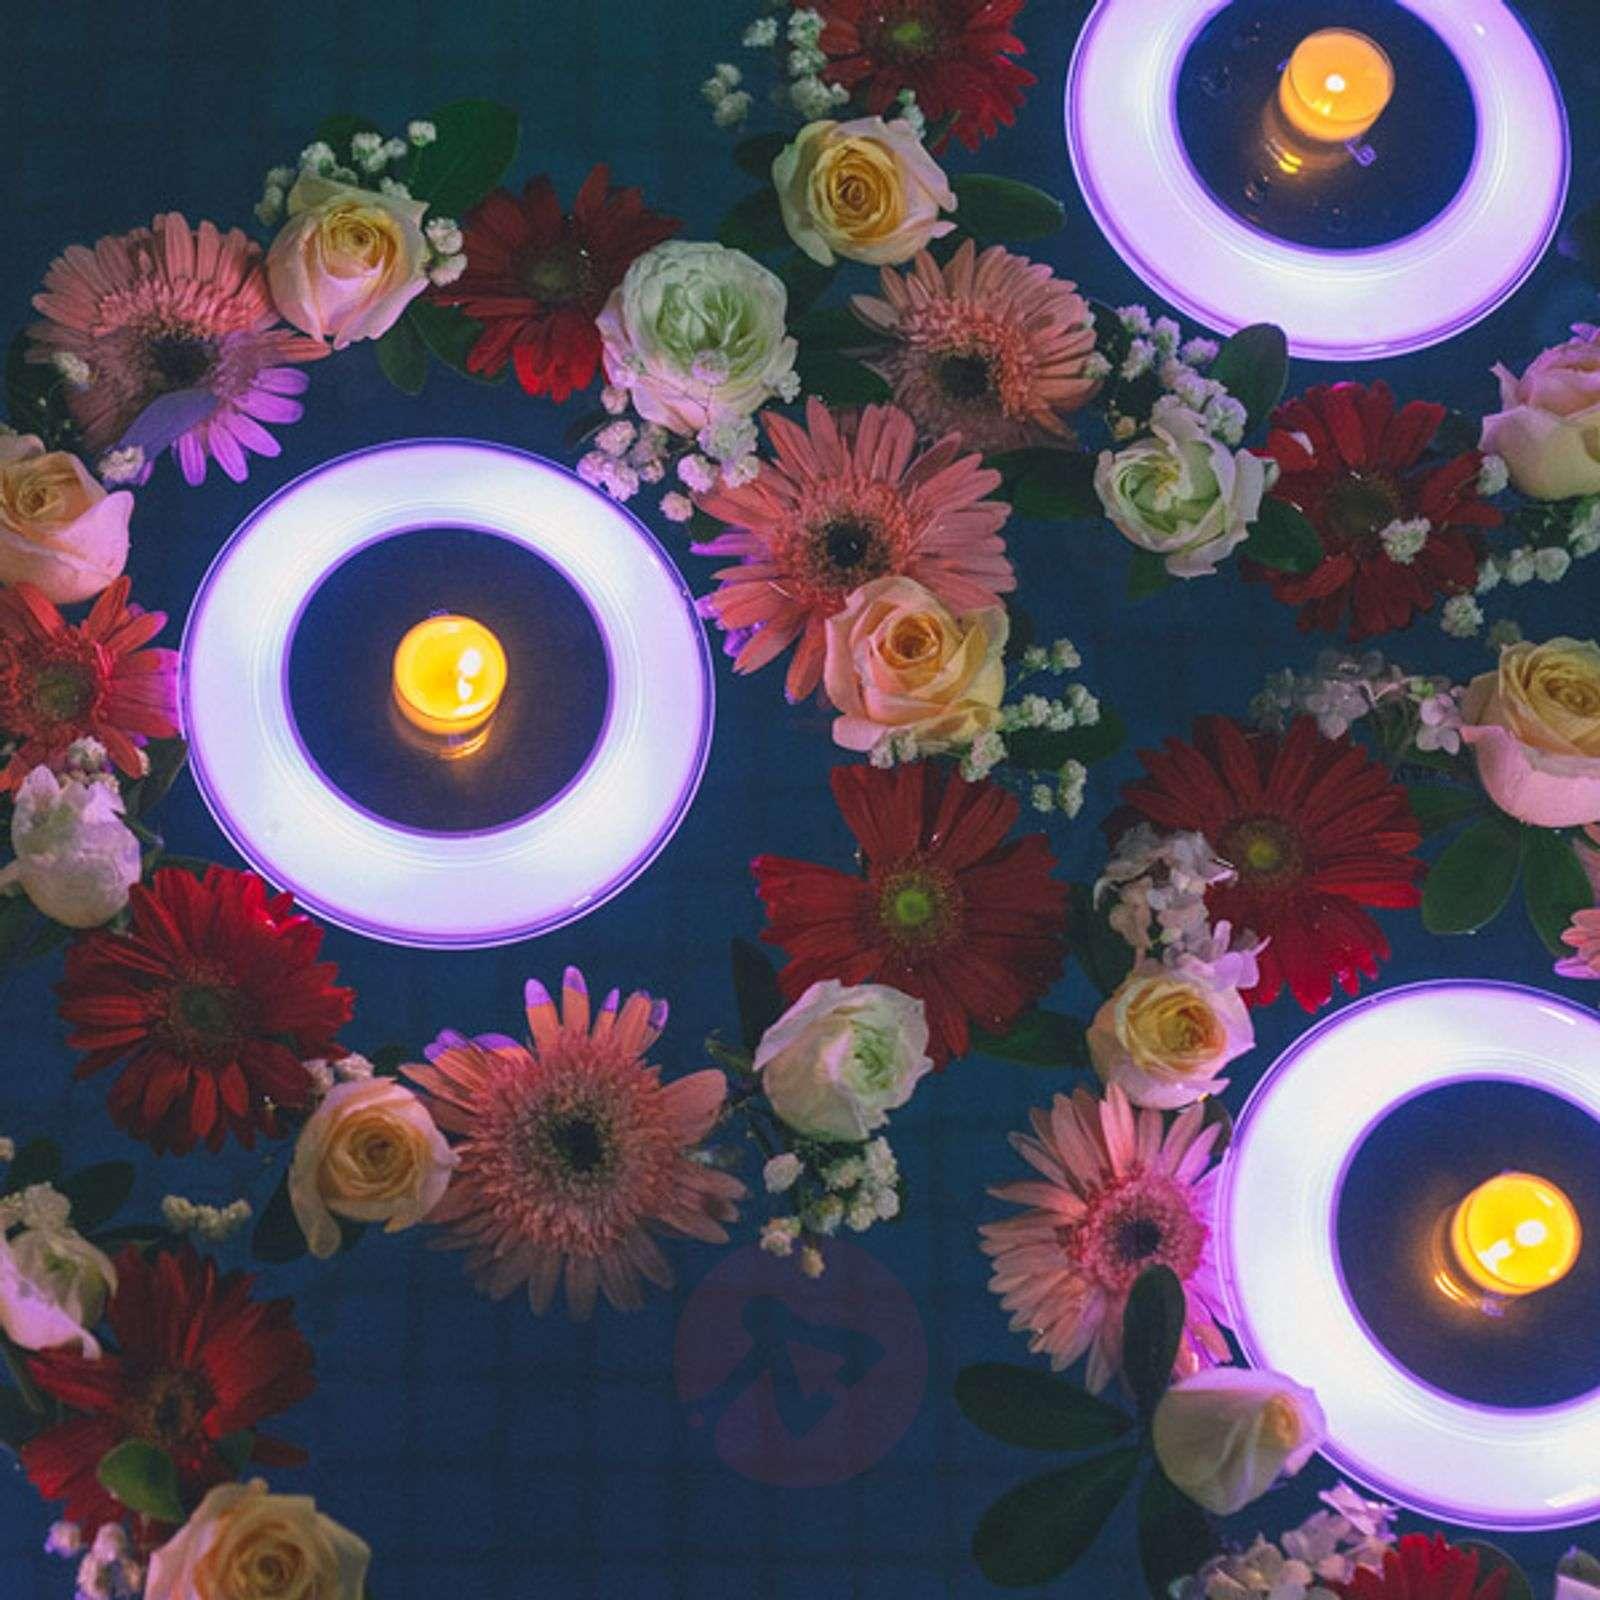 MiPow Playbulb LED-koristevalaisin, 3:n setti-5543021-01